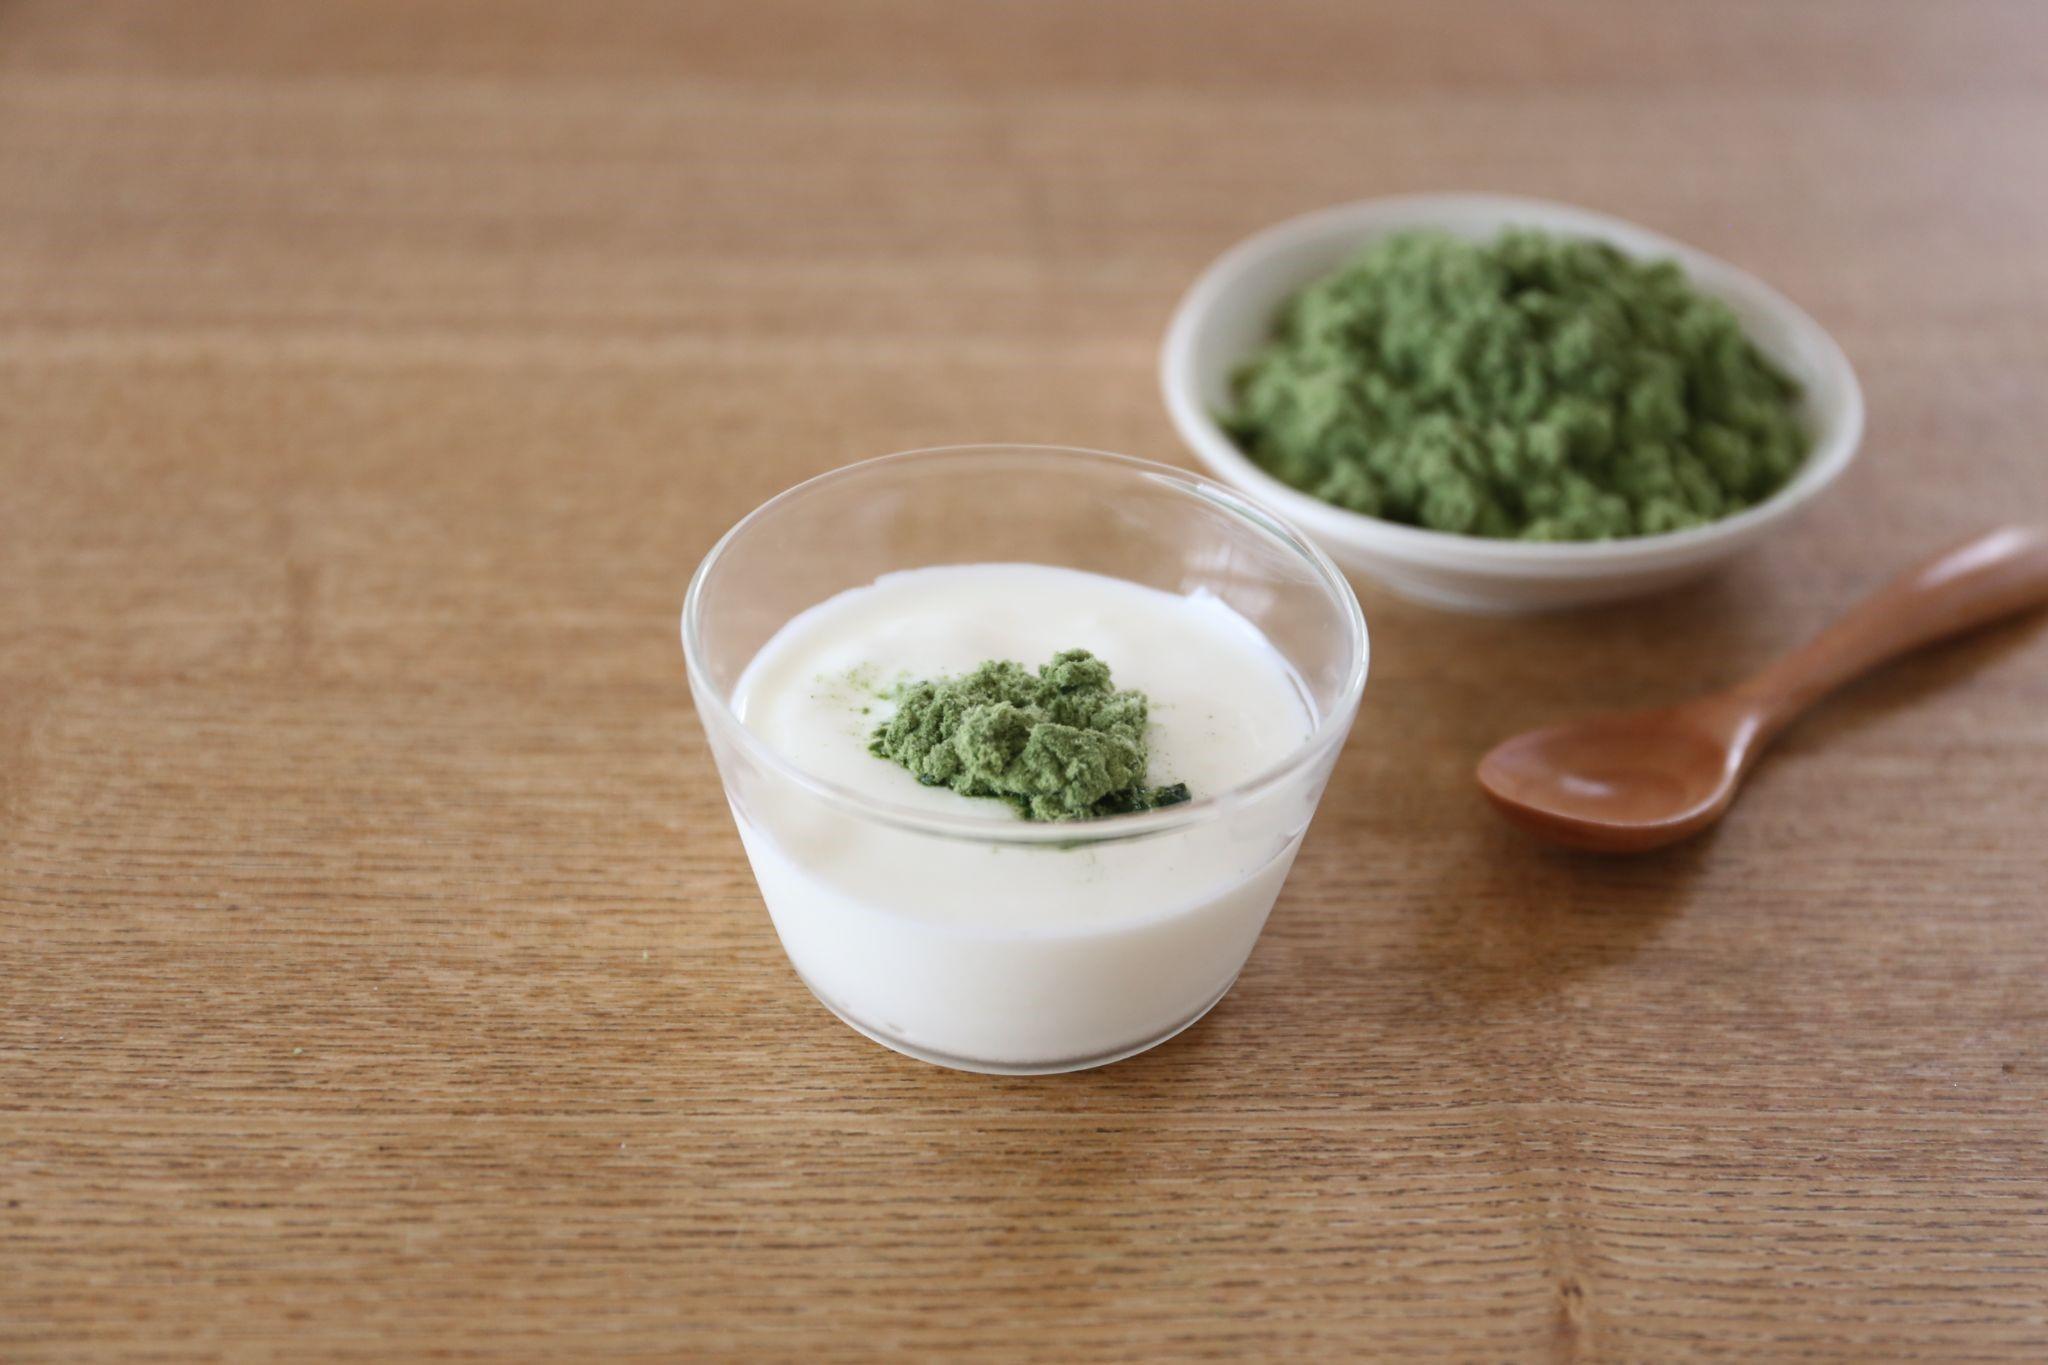 mugwort powder as a topping